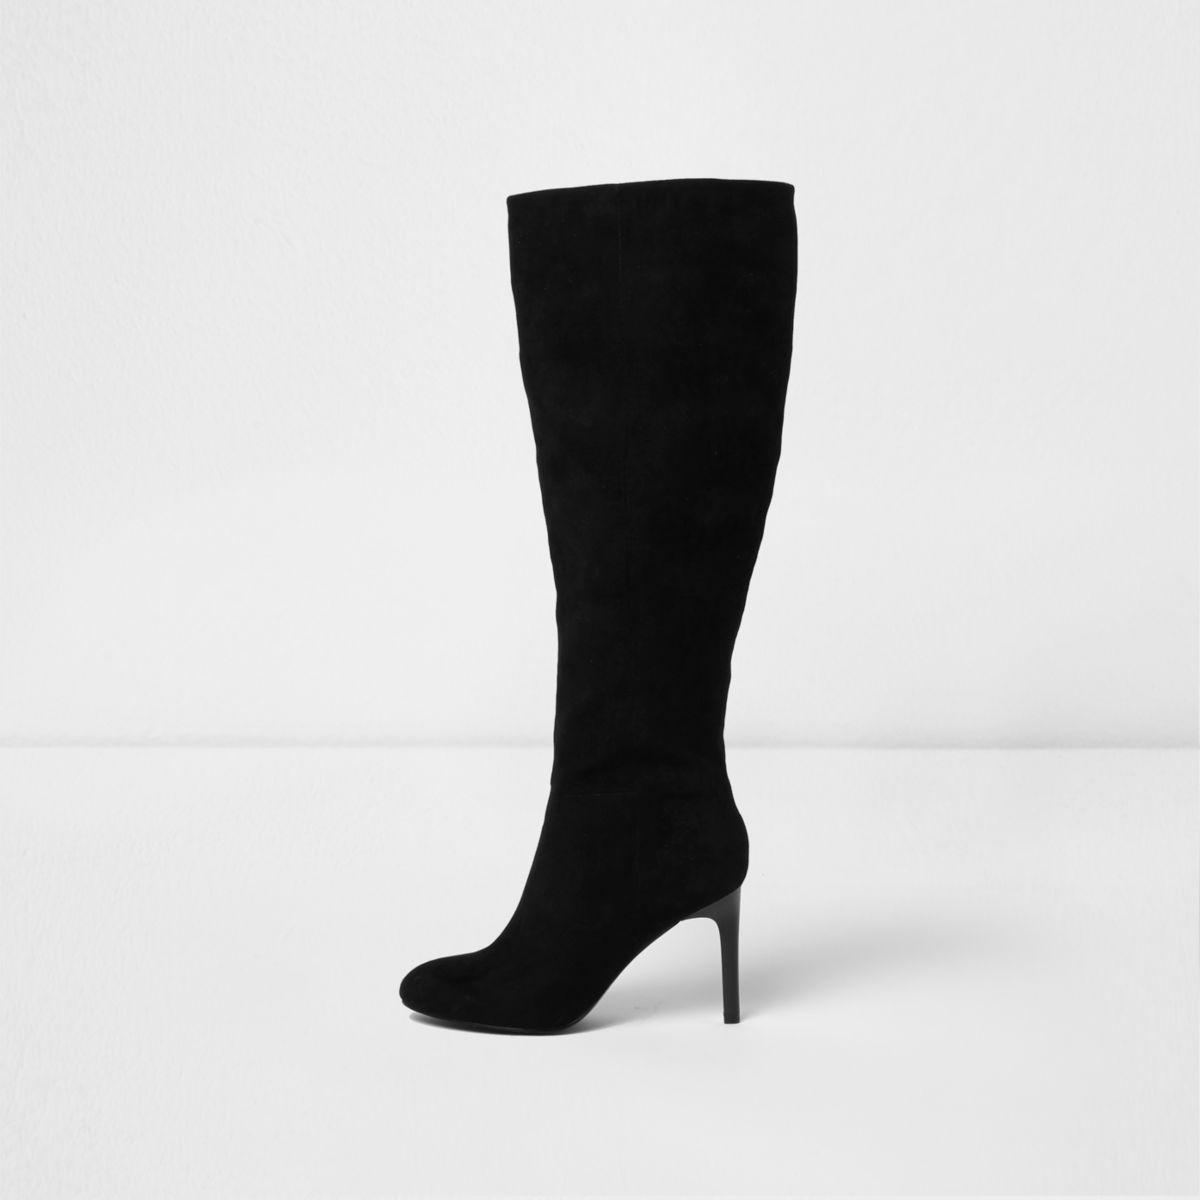 Overknee-Stiefel mit Stiletto-Absätzen